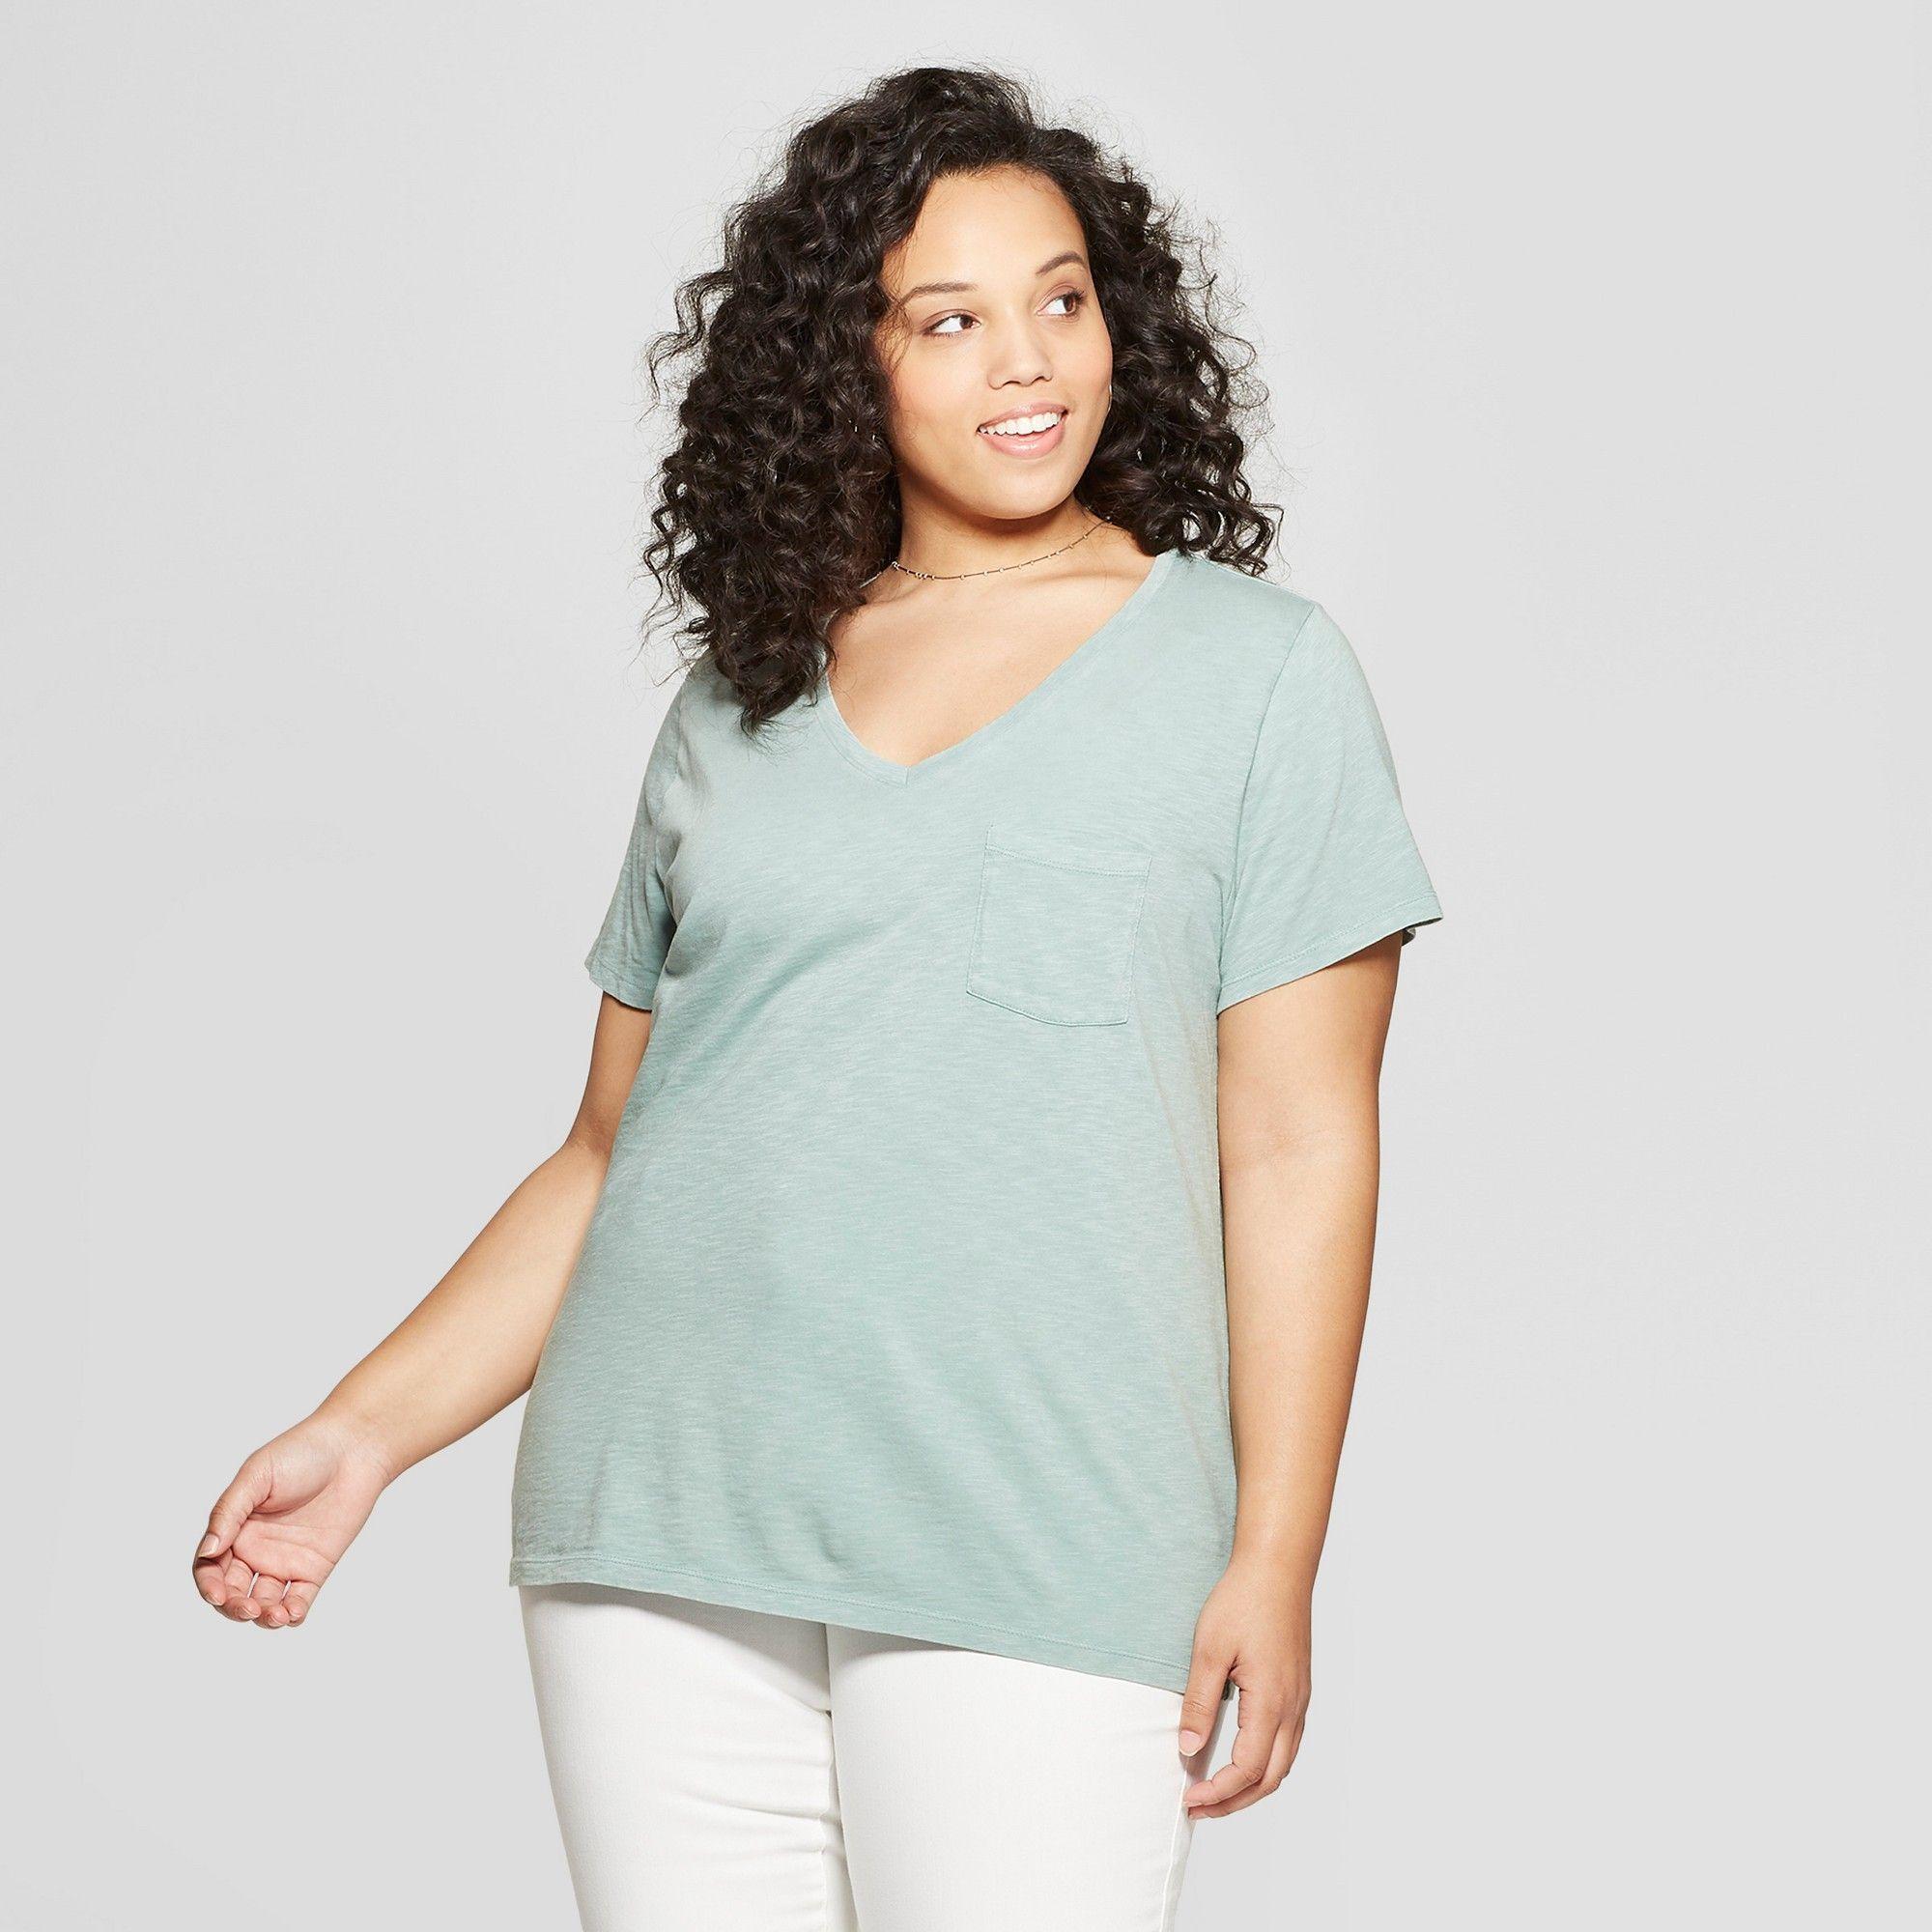 f1264272 Women's Plus Size Short Sleeve Pocket V-Neck T-Shirt - Universal Thread  Green 1X